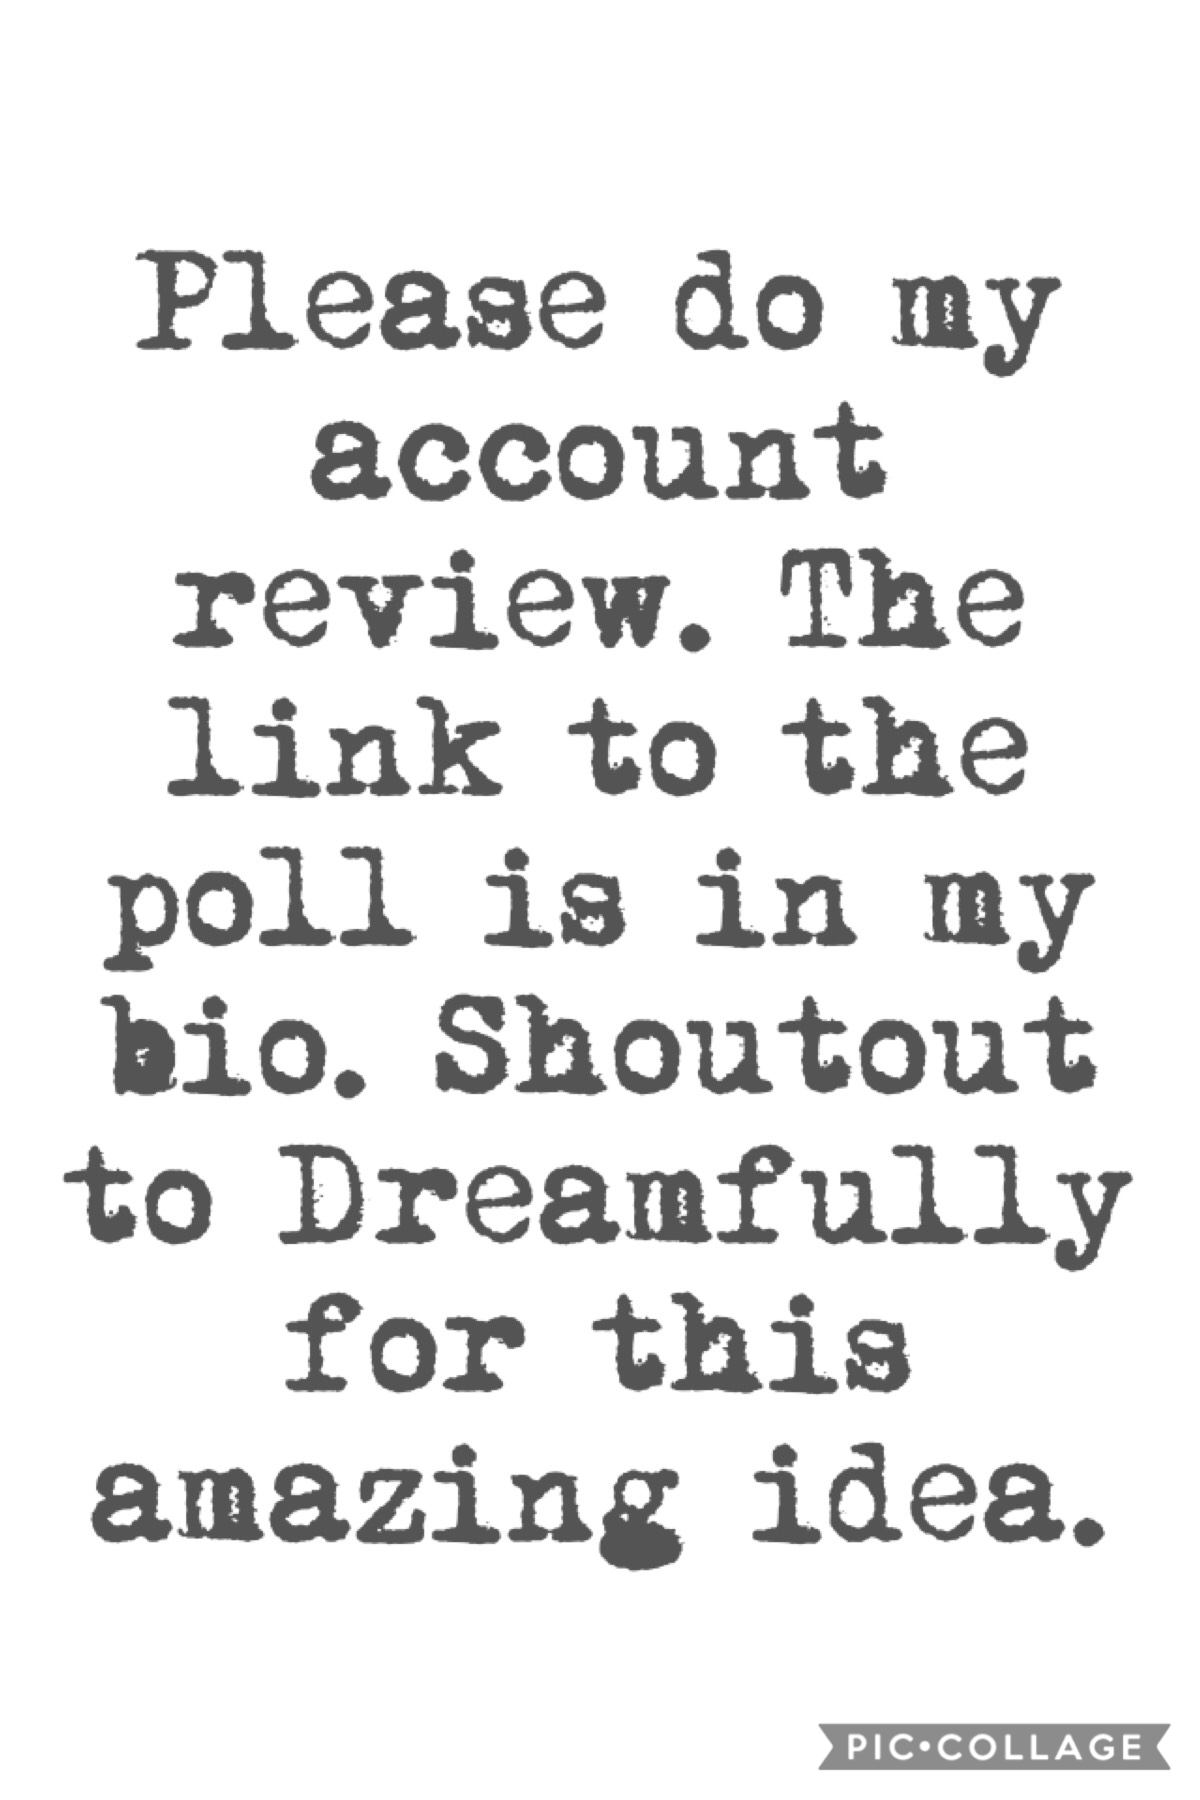 Plz do the review! Thanks Dreamfully!